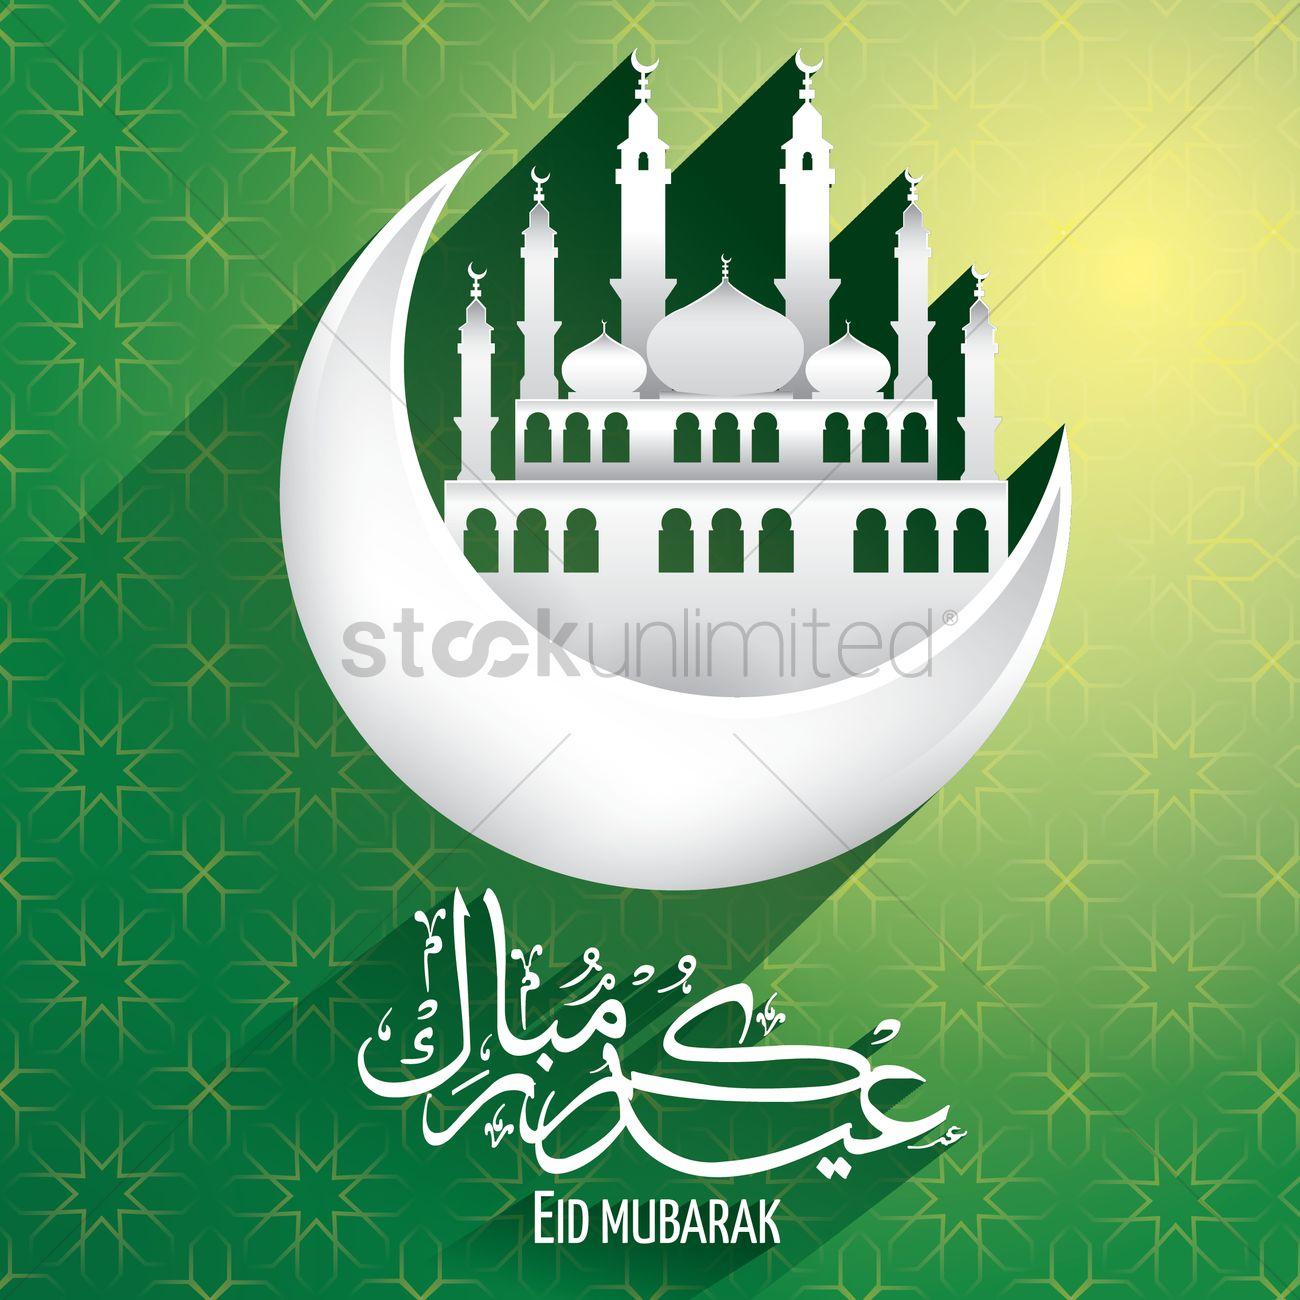 Eid mubarak design vector image 1823314 stockunlimited eid mubarak design vector graphic kristyandbryce Image collections